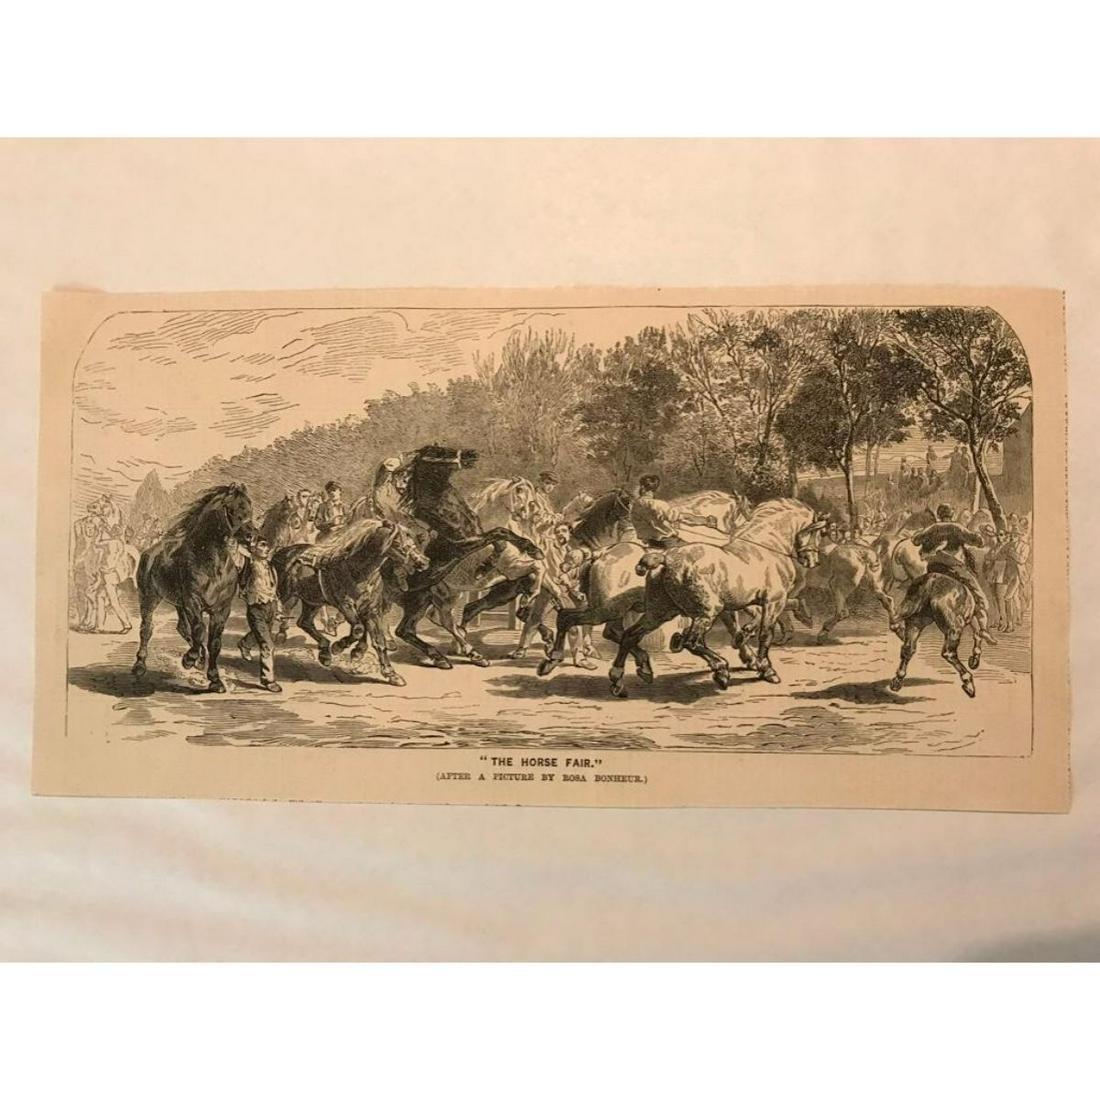 19thc Wood Engraving, After Bonheur The Horse Fair